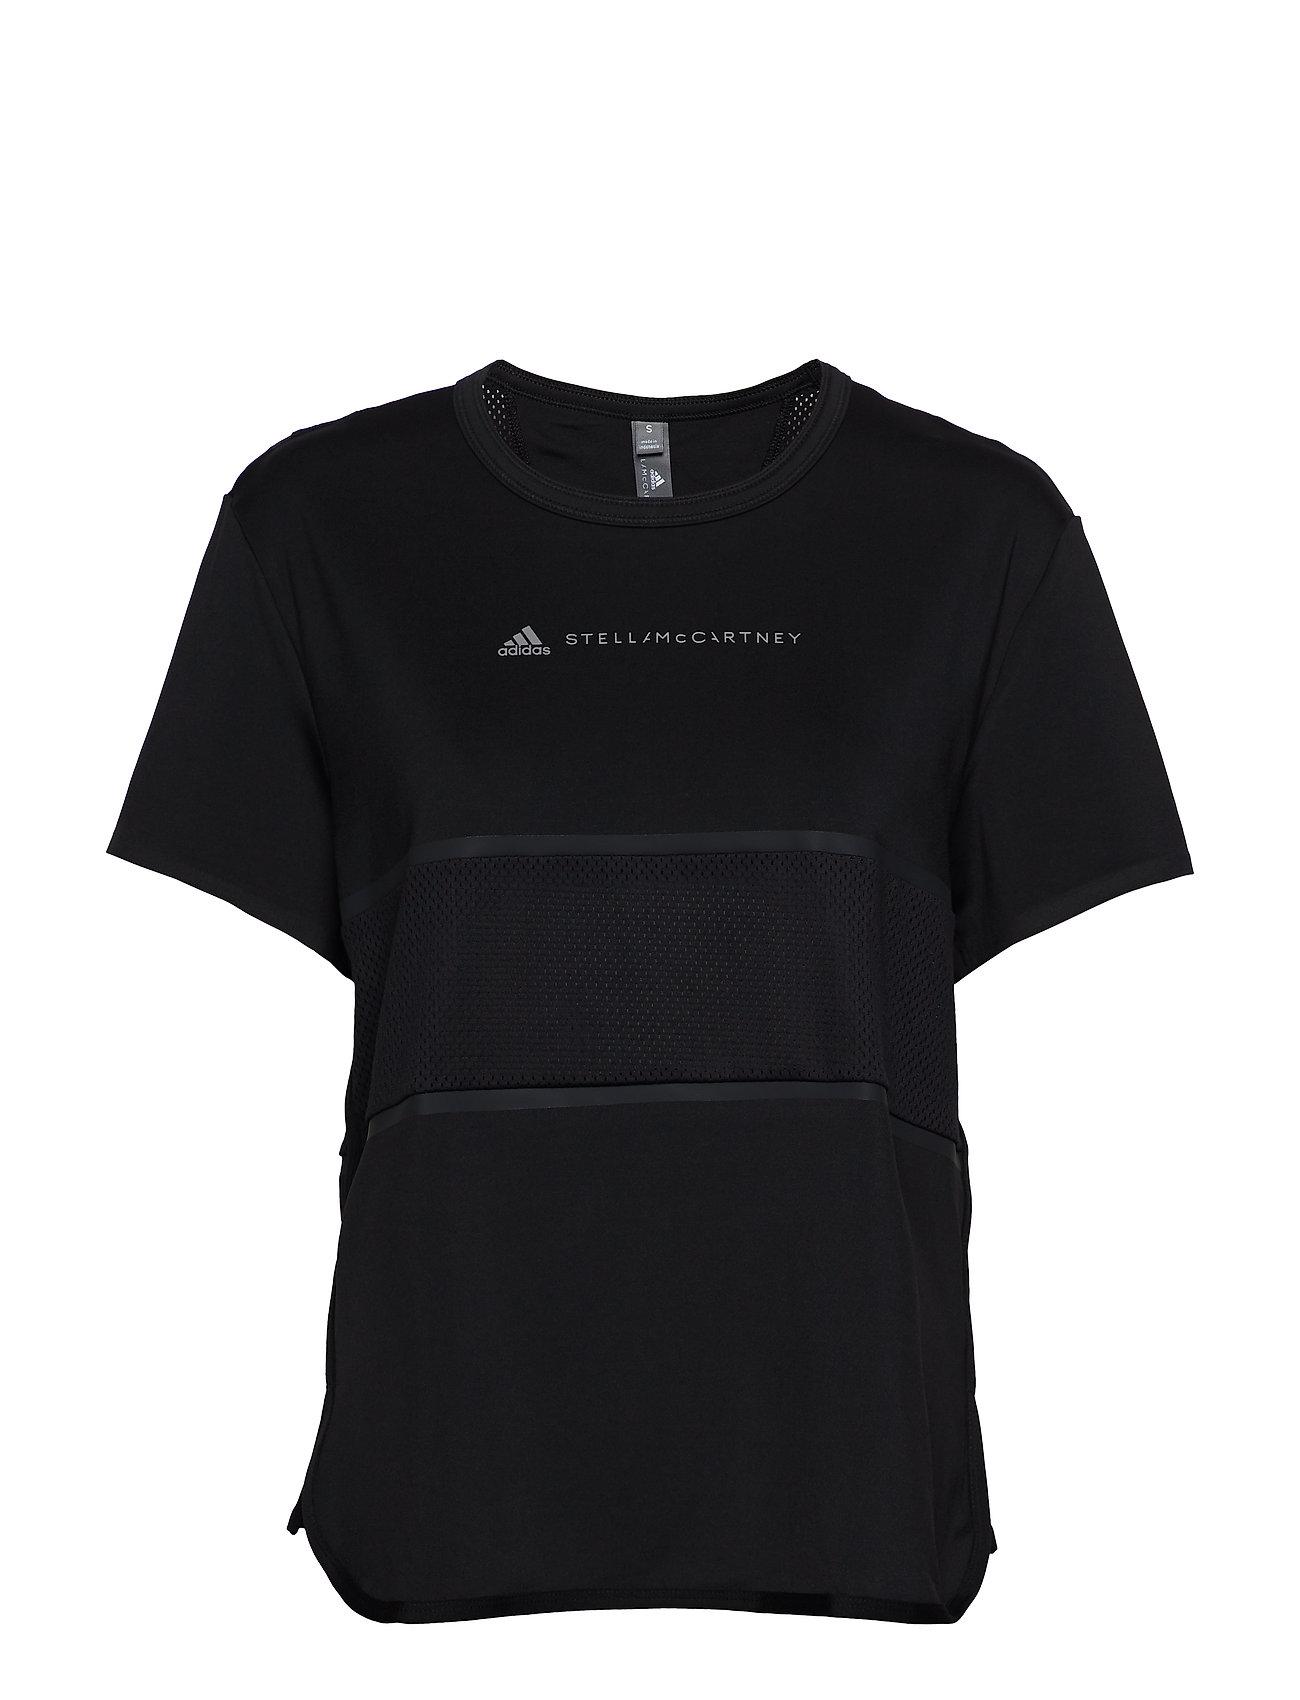 adidas by Stella McCartney RUN LOOSE TEE - BLACK